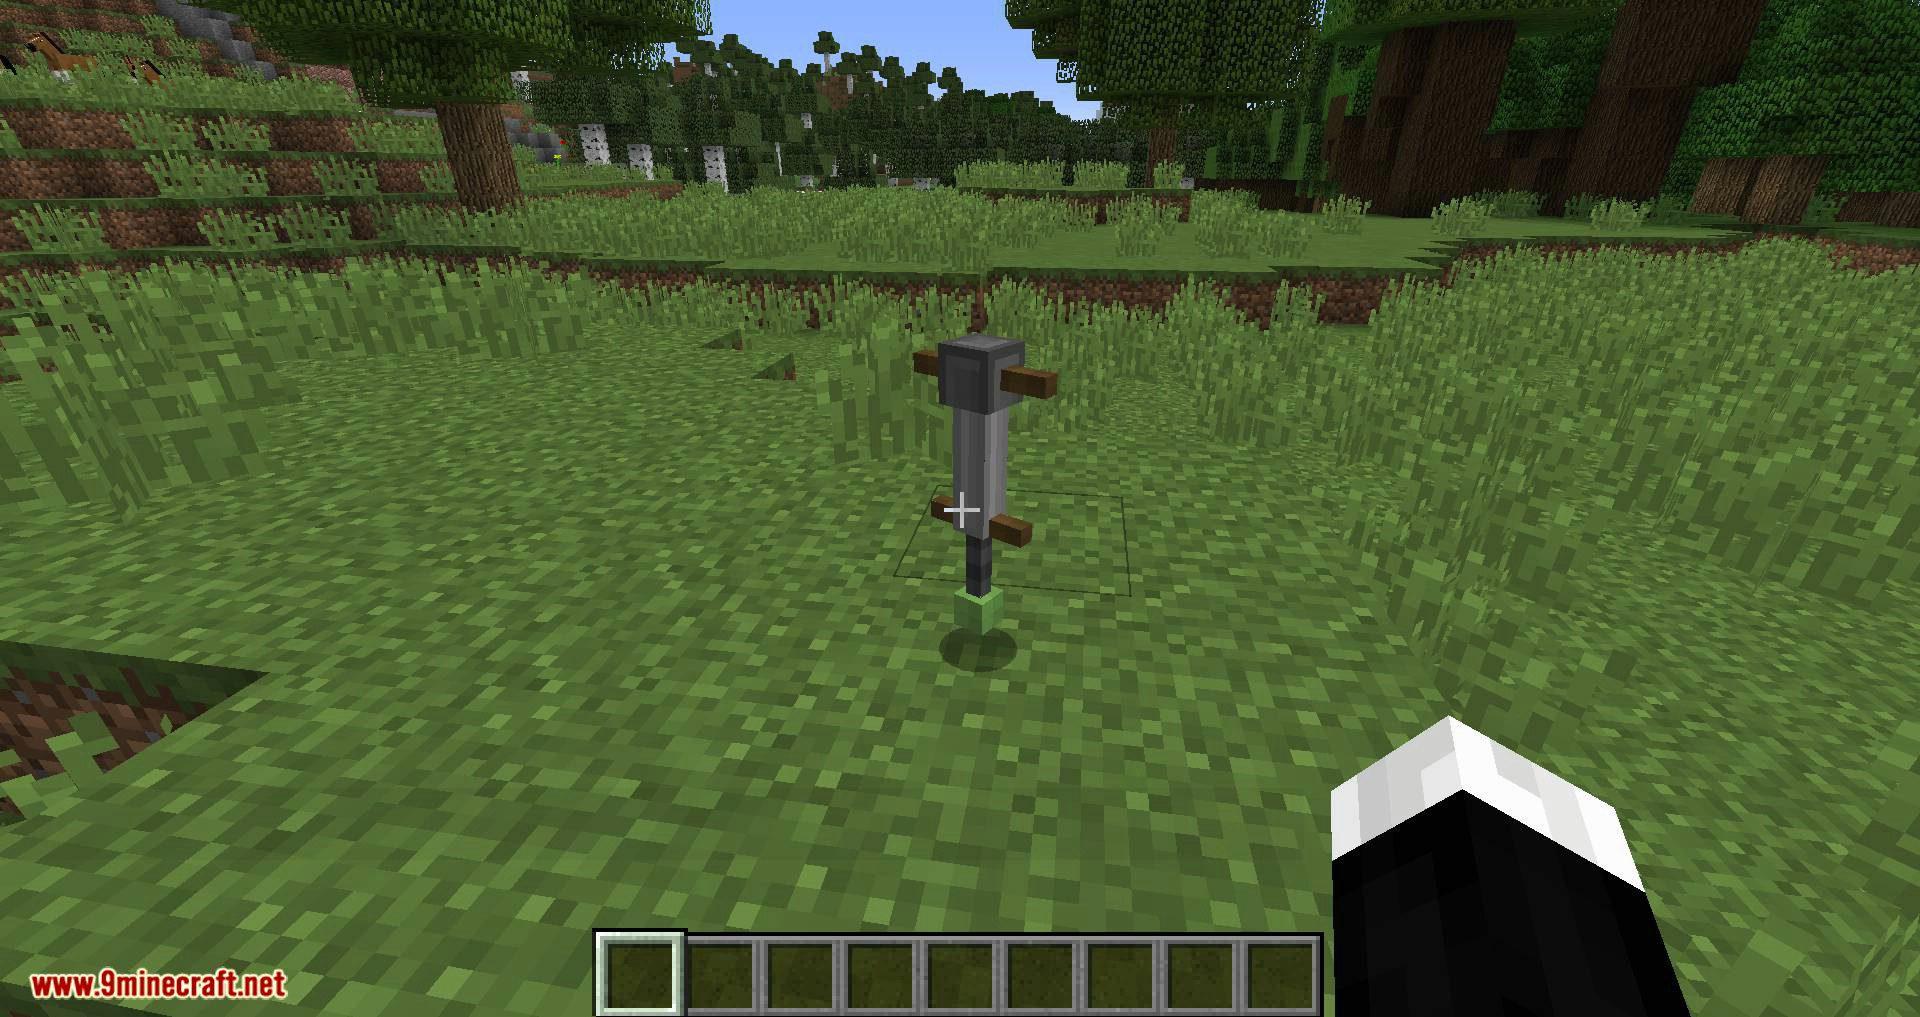 Pogo Sticks mod for minecraft 01